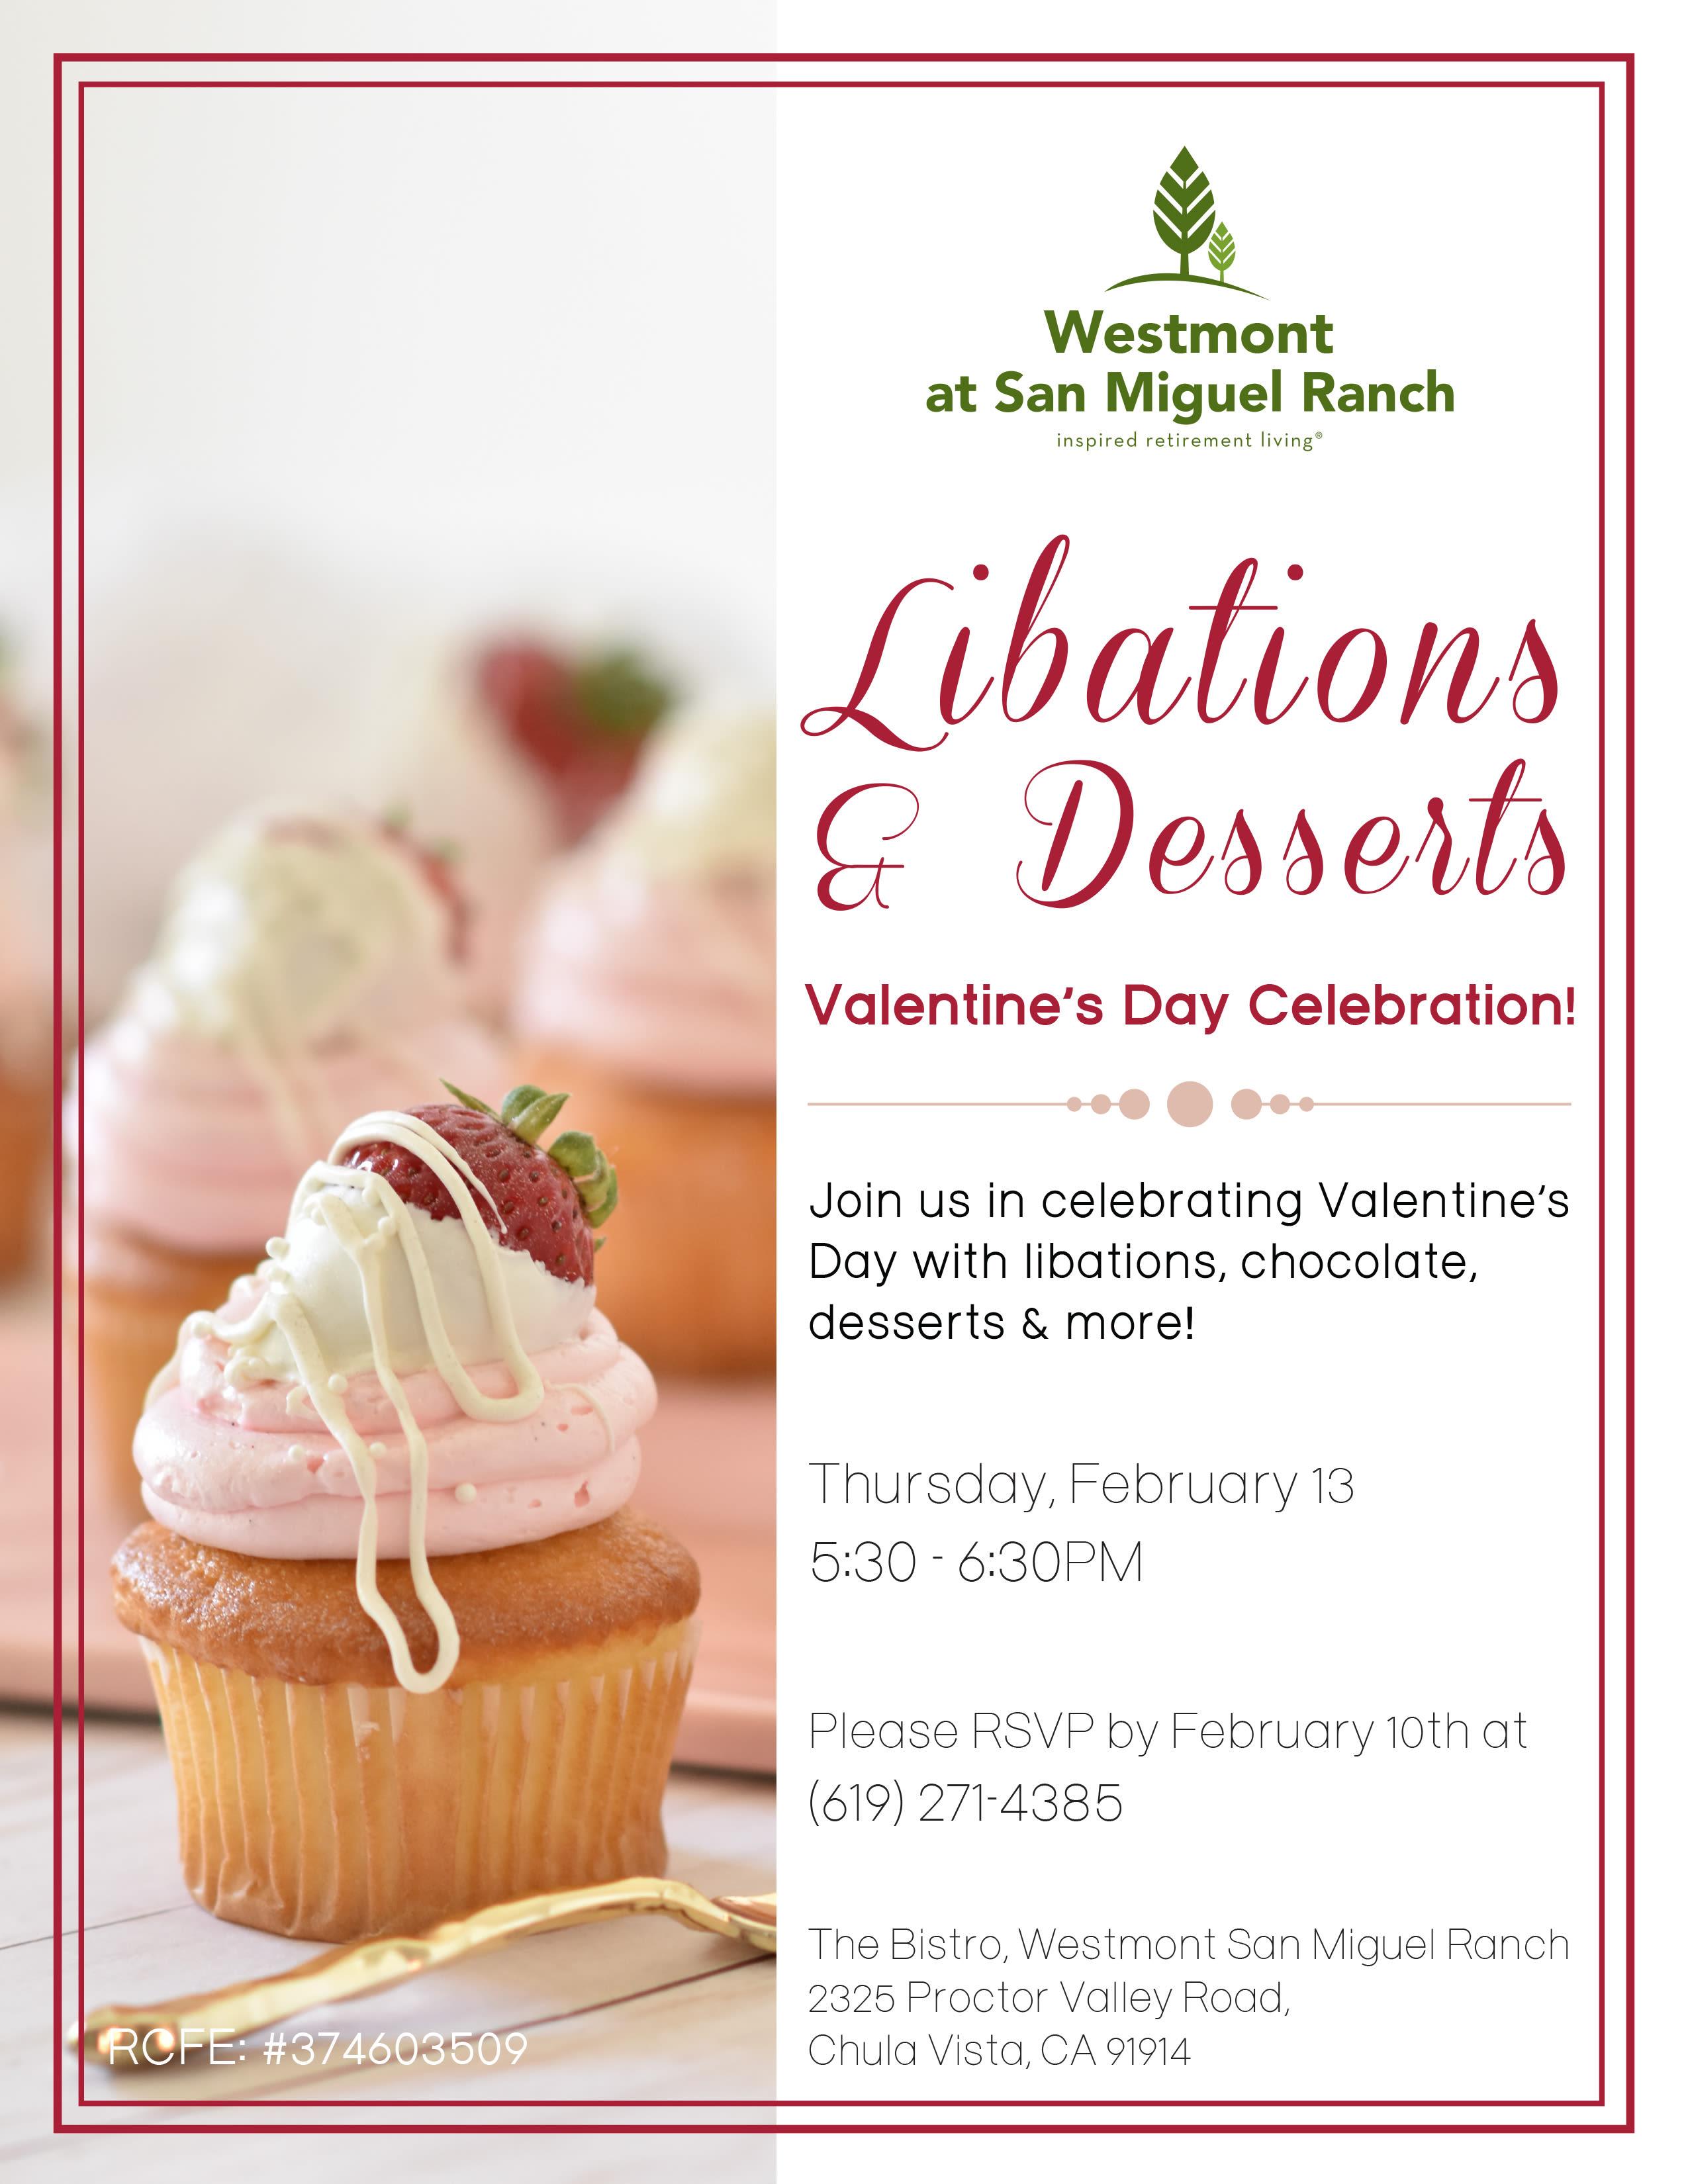 Libations & Desserts